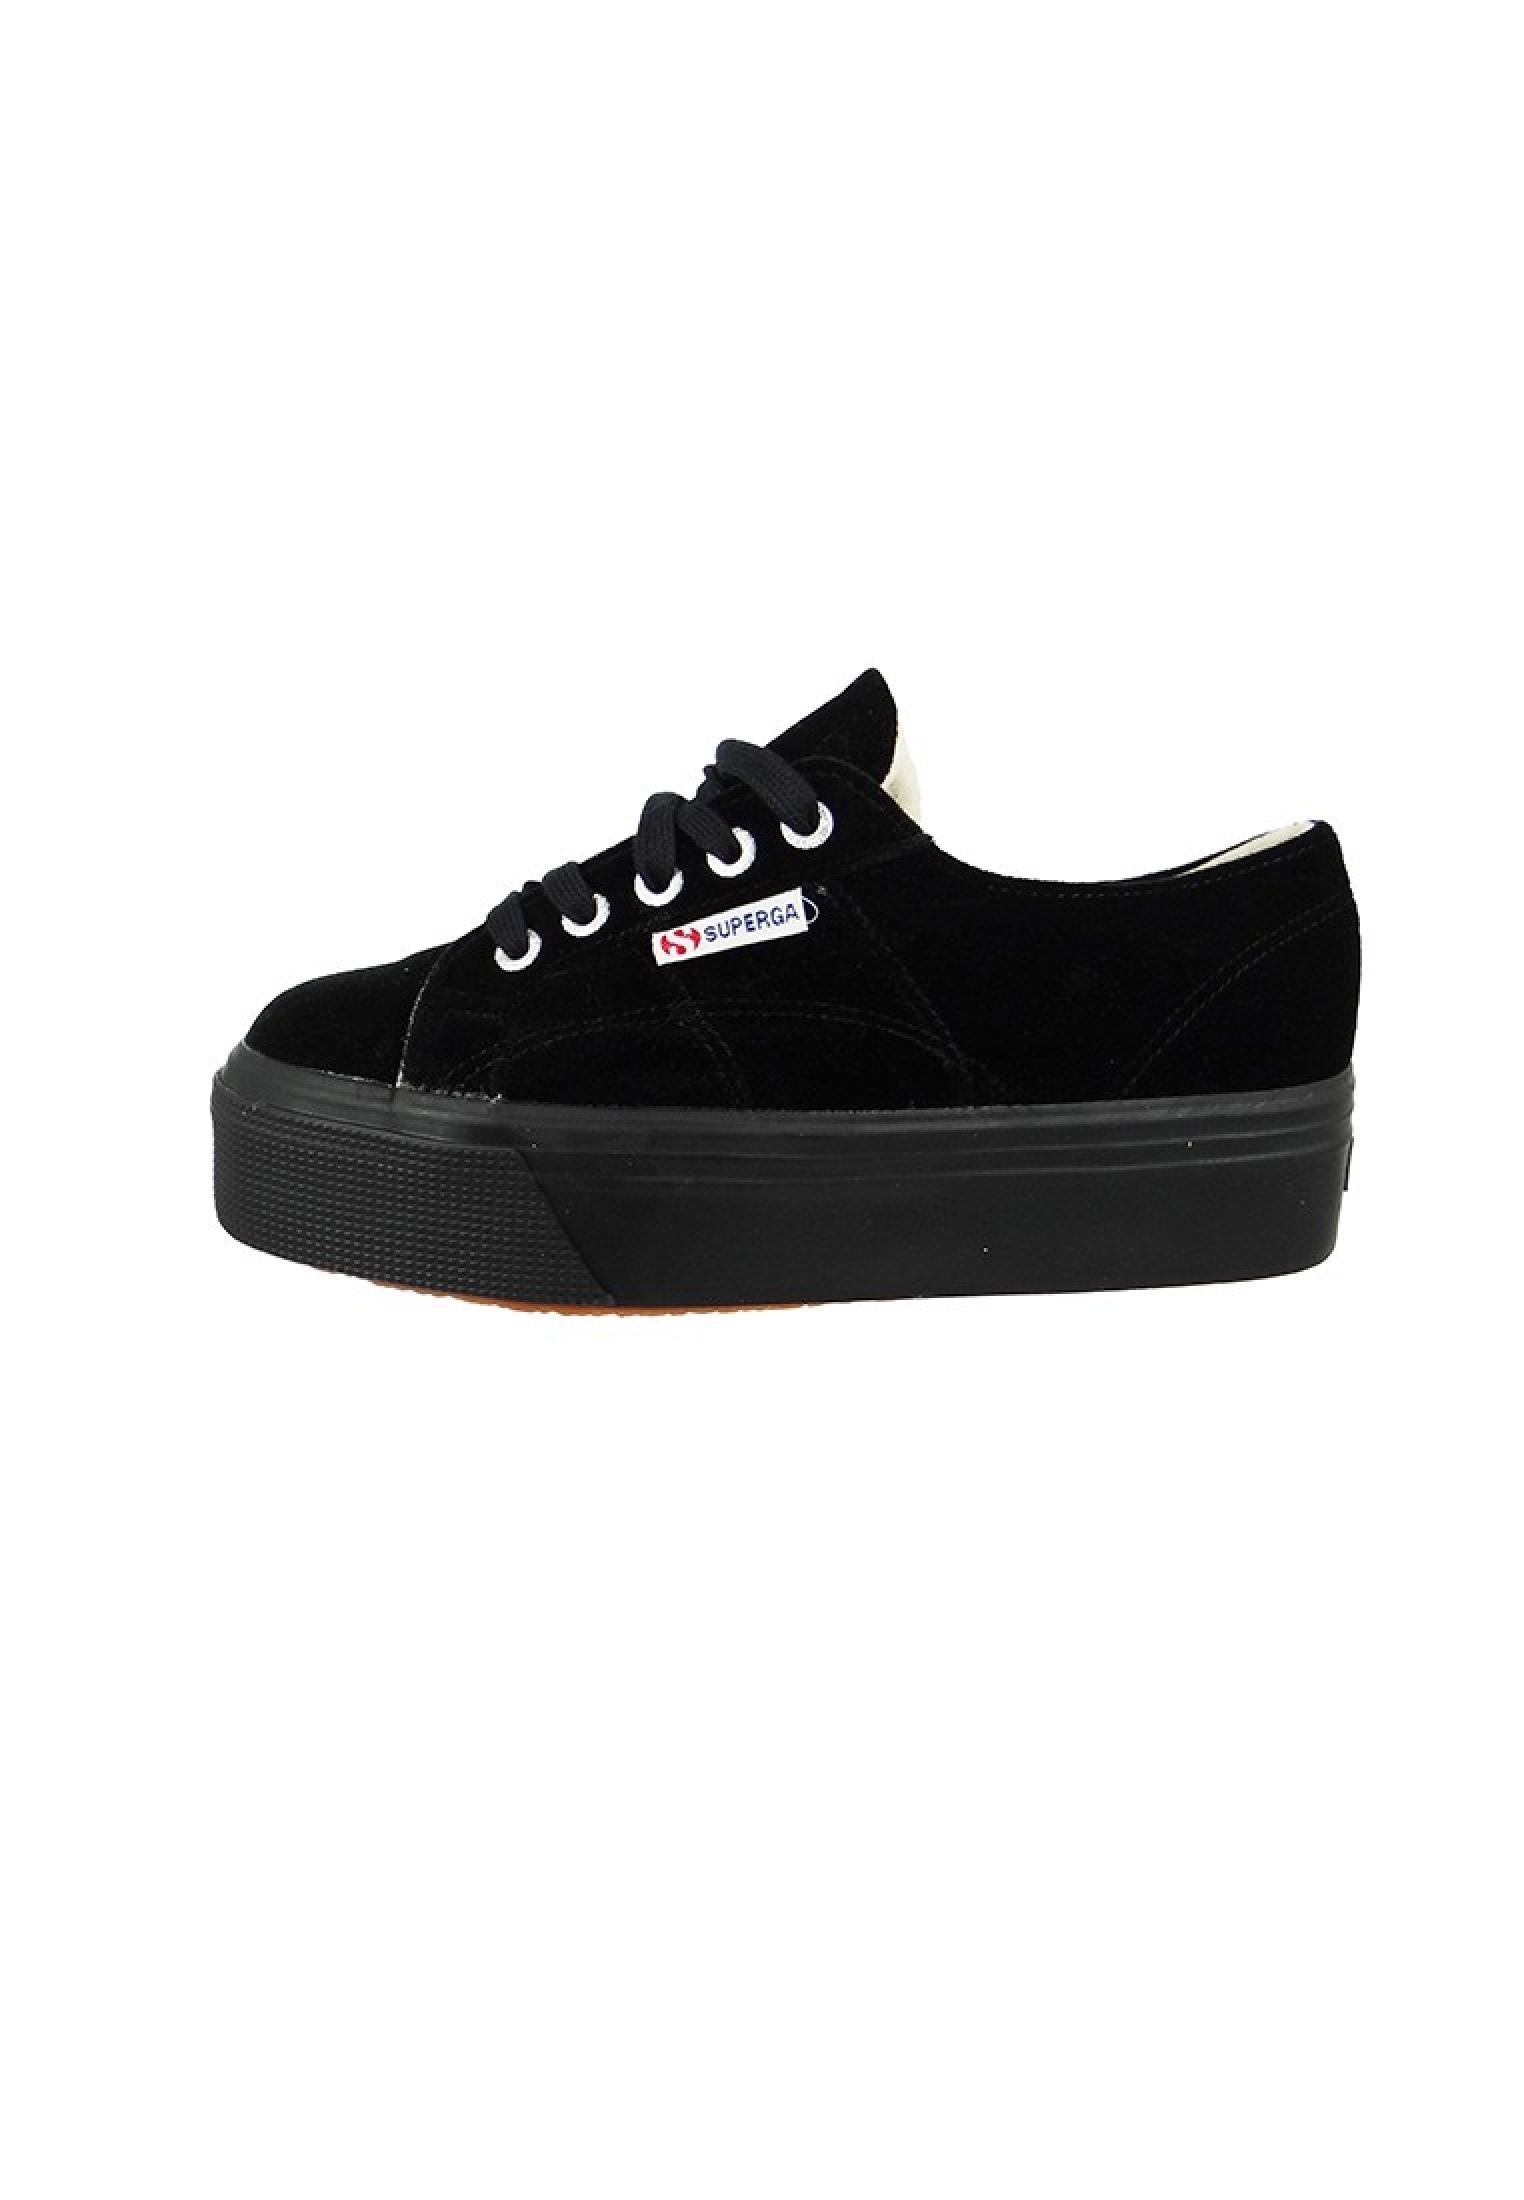 superga schuhe sneaker 2790 cotu plateau velvet black schwarz damenschuhe sneaker. Black Bedroom Furniture Sets. Home Design Ideas